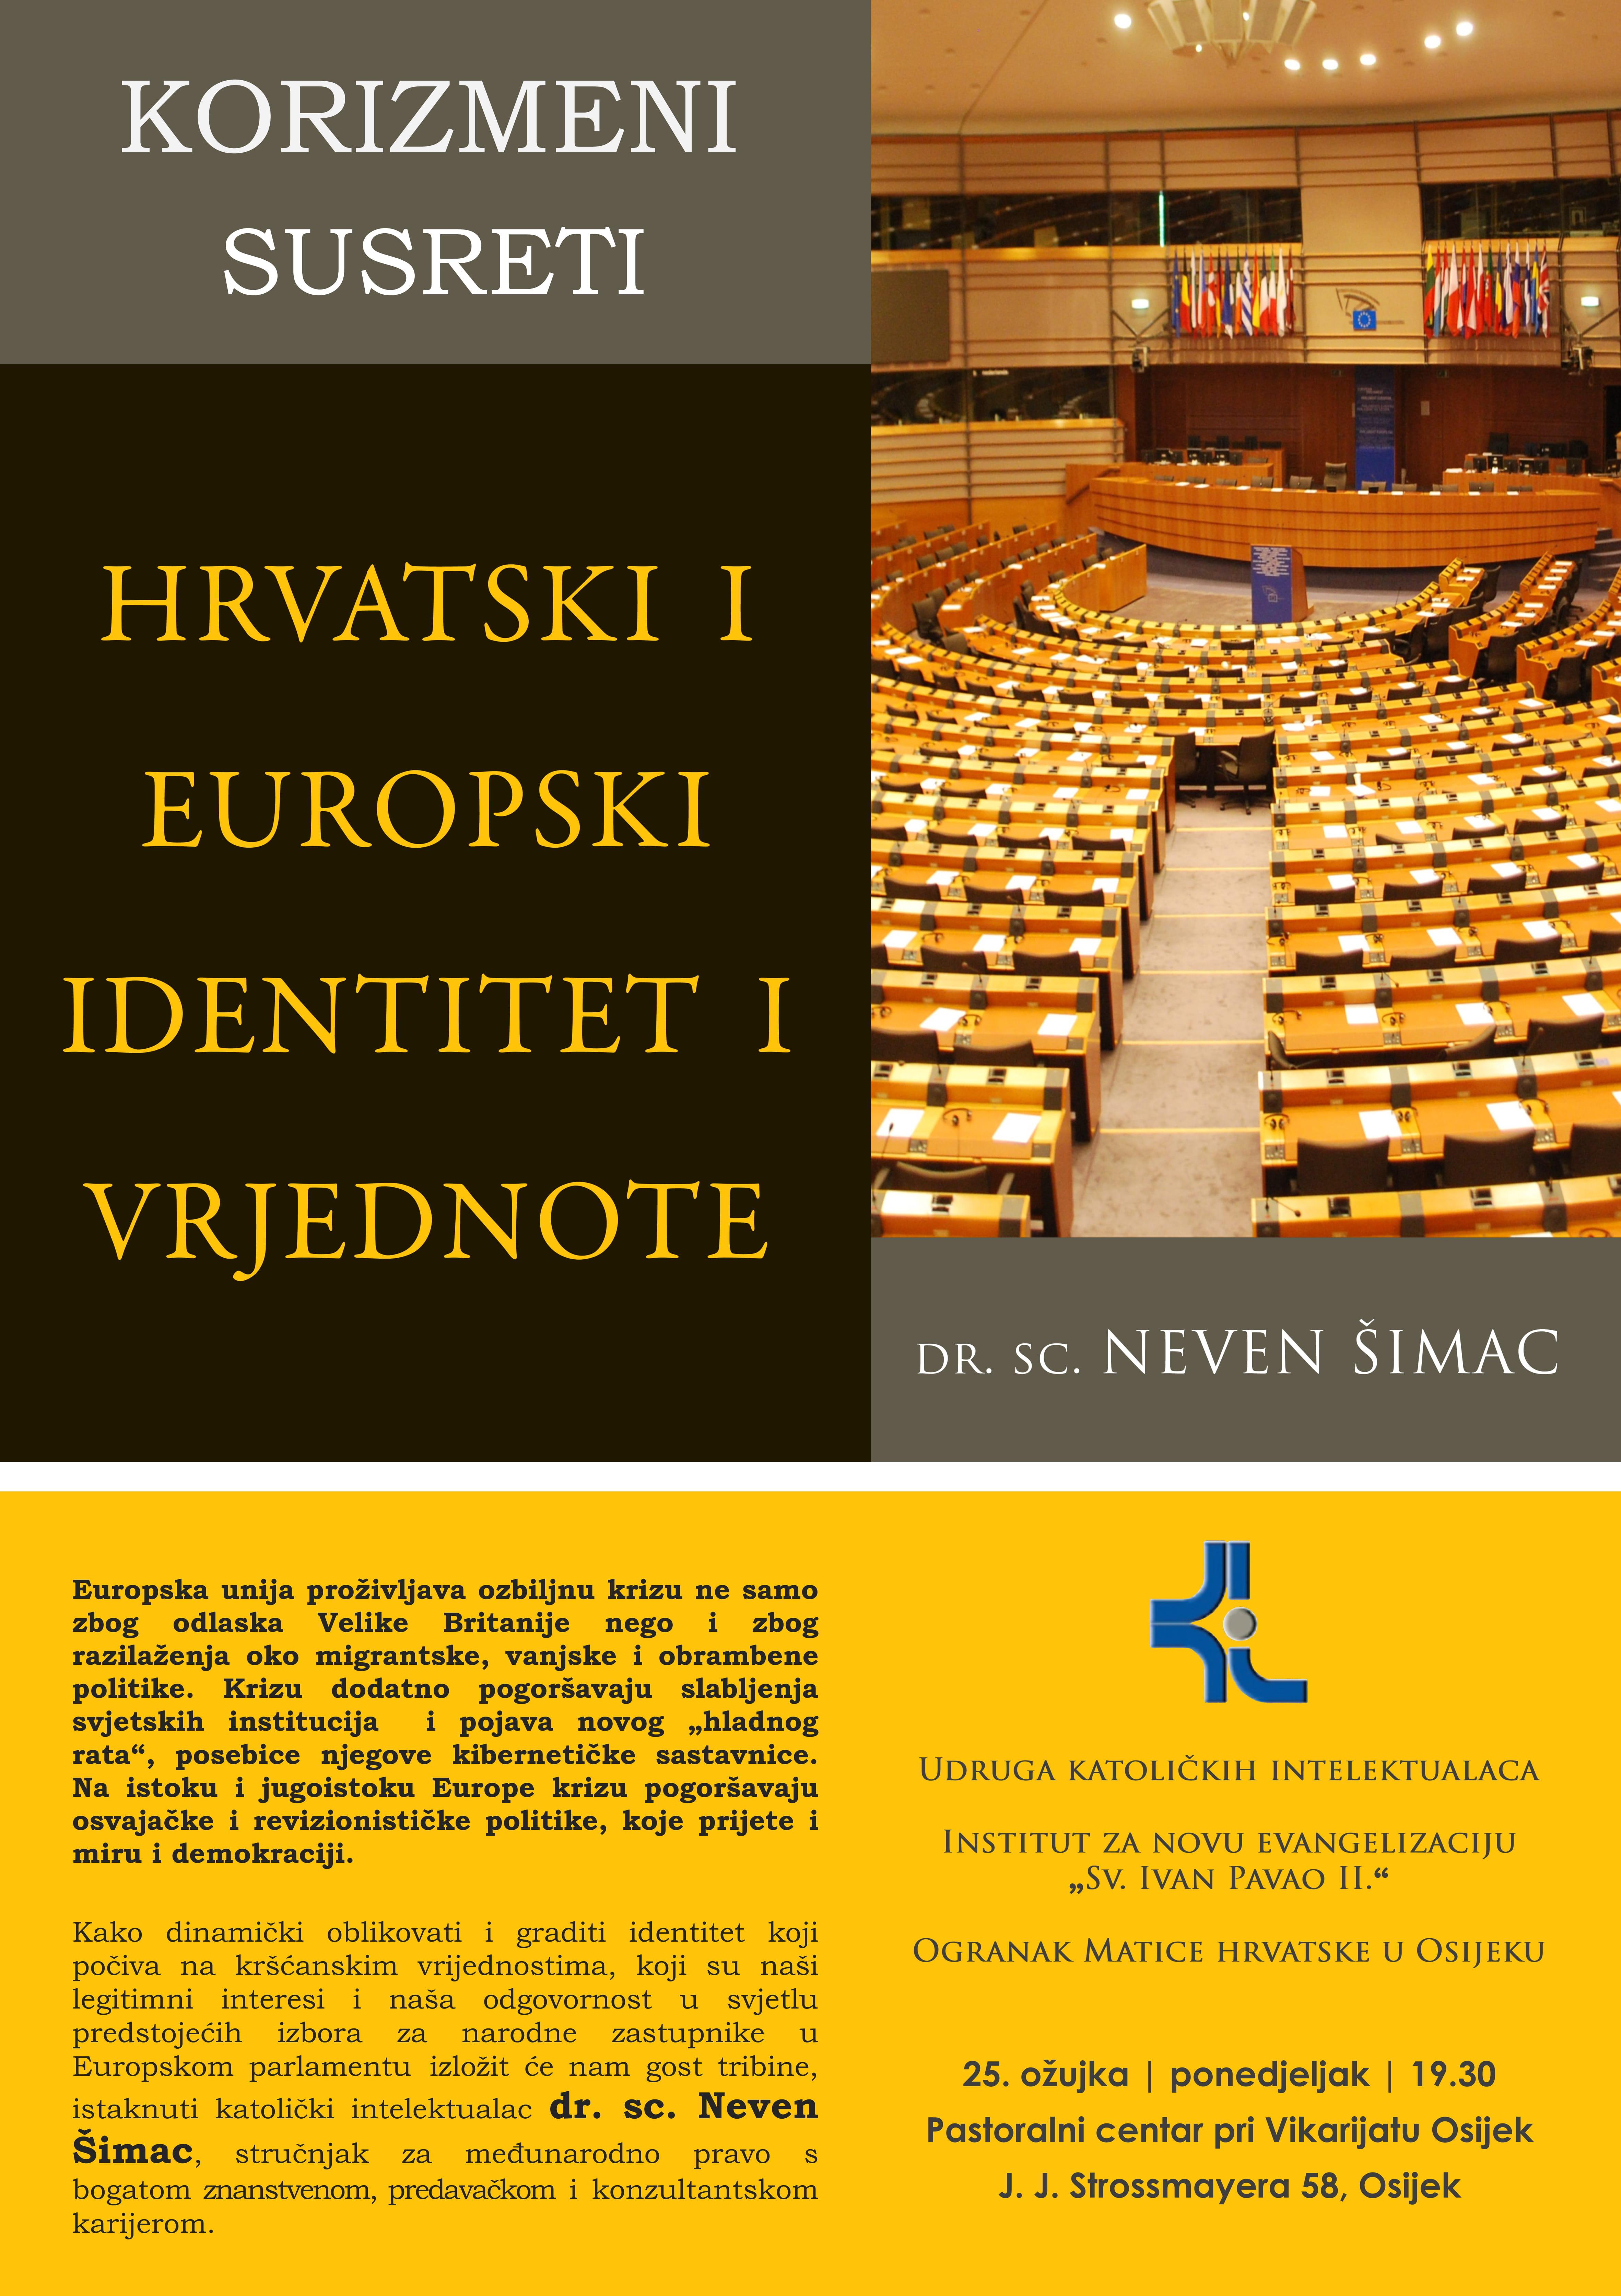 uki_3_koizma_šimac_plakat-1